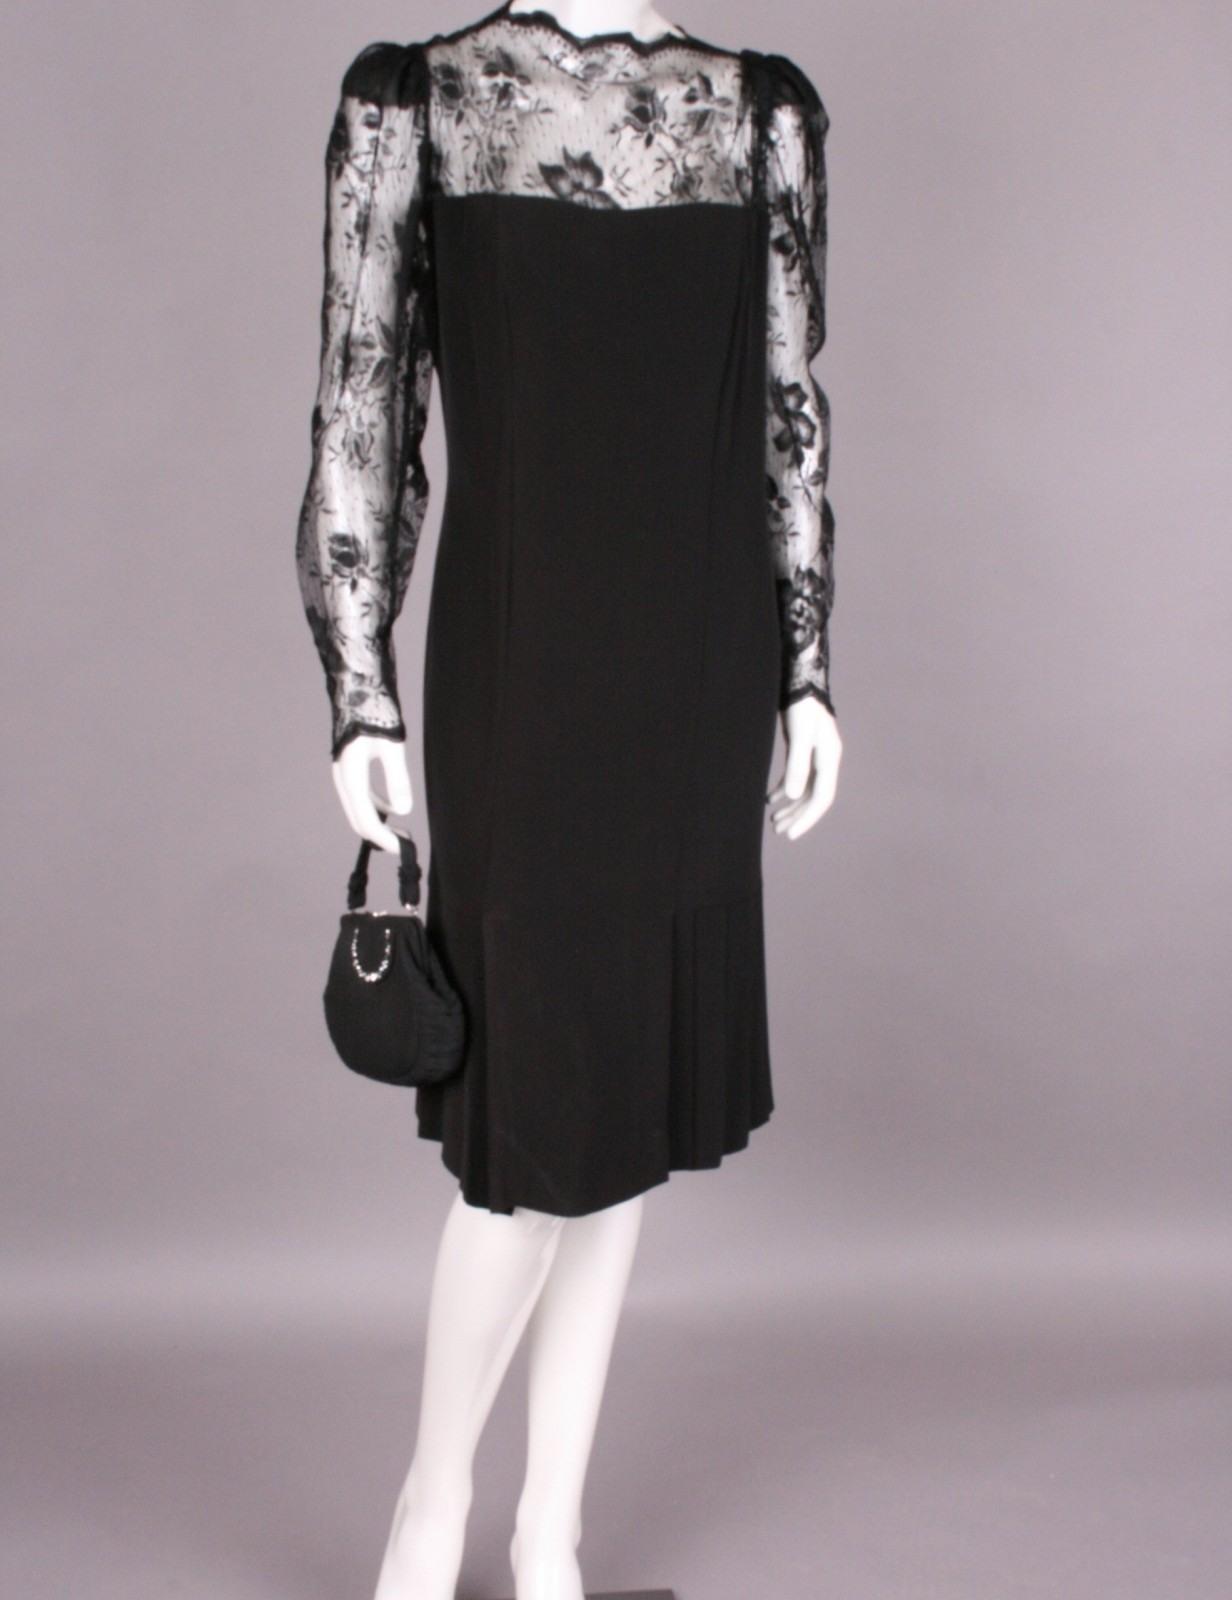 Formal Fantastisch Kleid Gr 42 DesignAbend Coolste Kleid Gr 42 Bester Preis